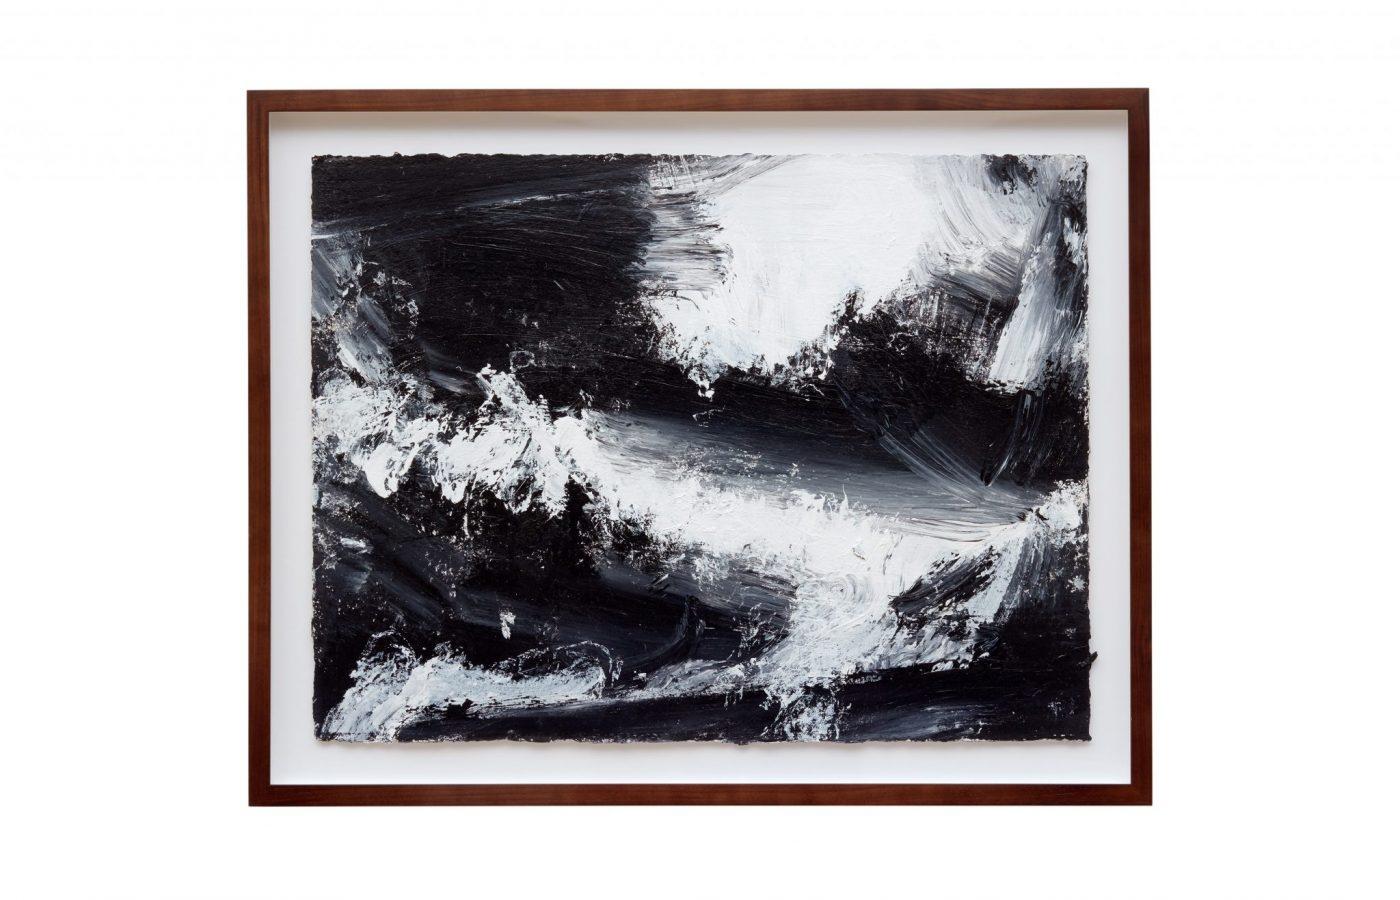 FXF18-18 John Virtue Untitled No 5 2014